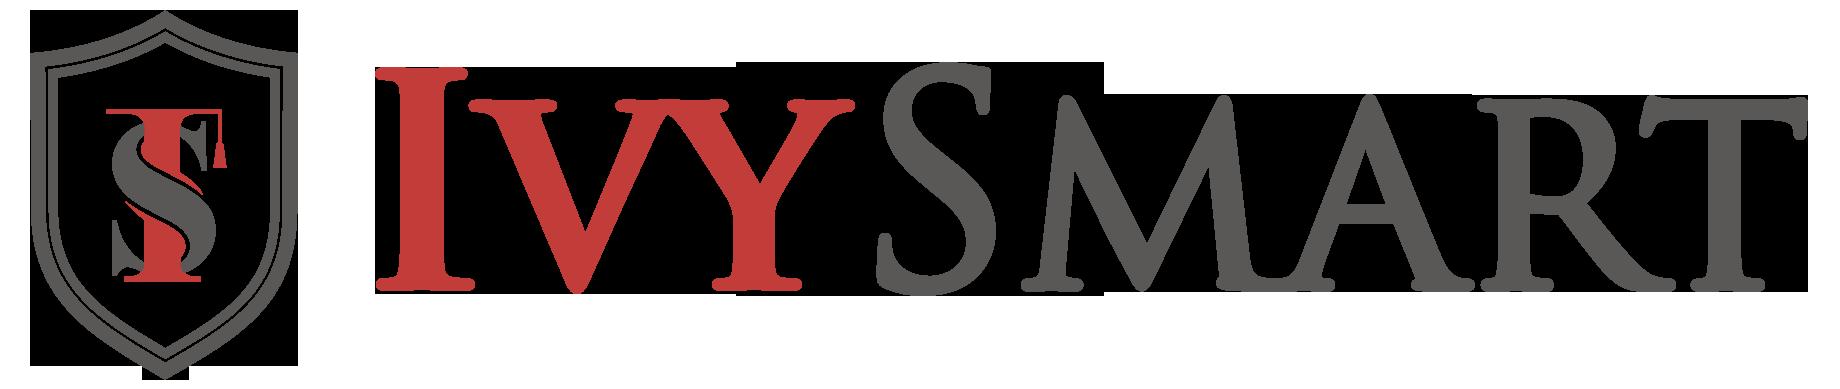 IvySmart Education- South Bay's most recommended After School Summer SmartCamp SAT Prep